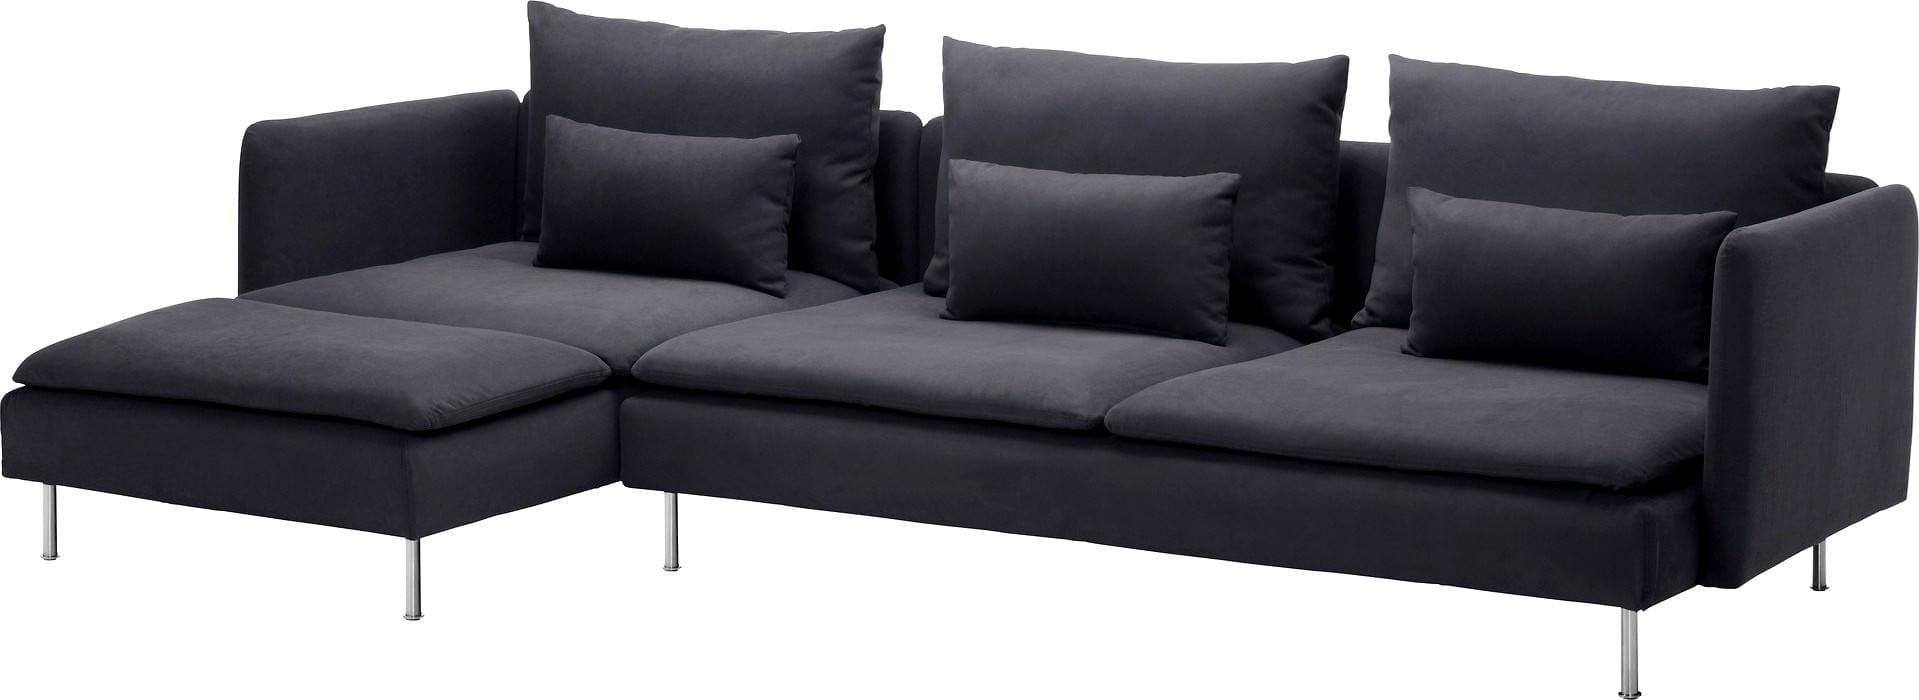 ikea-2015-kose-koltuk-modelleri